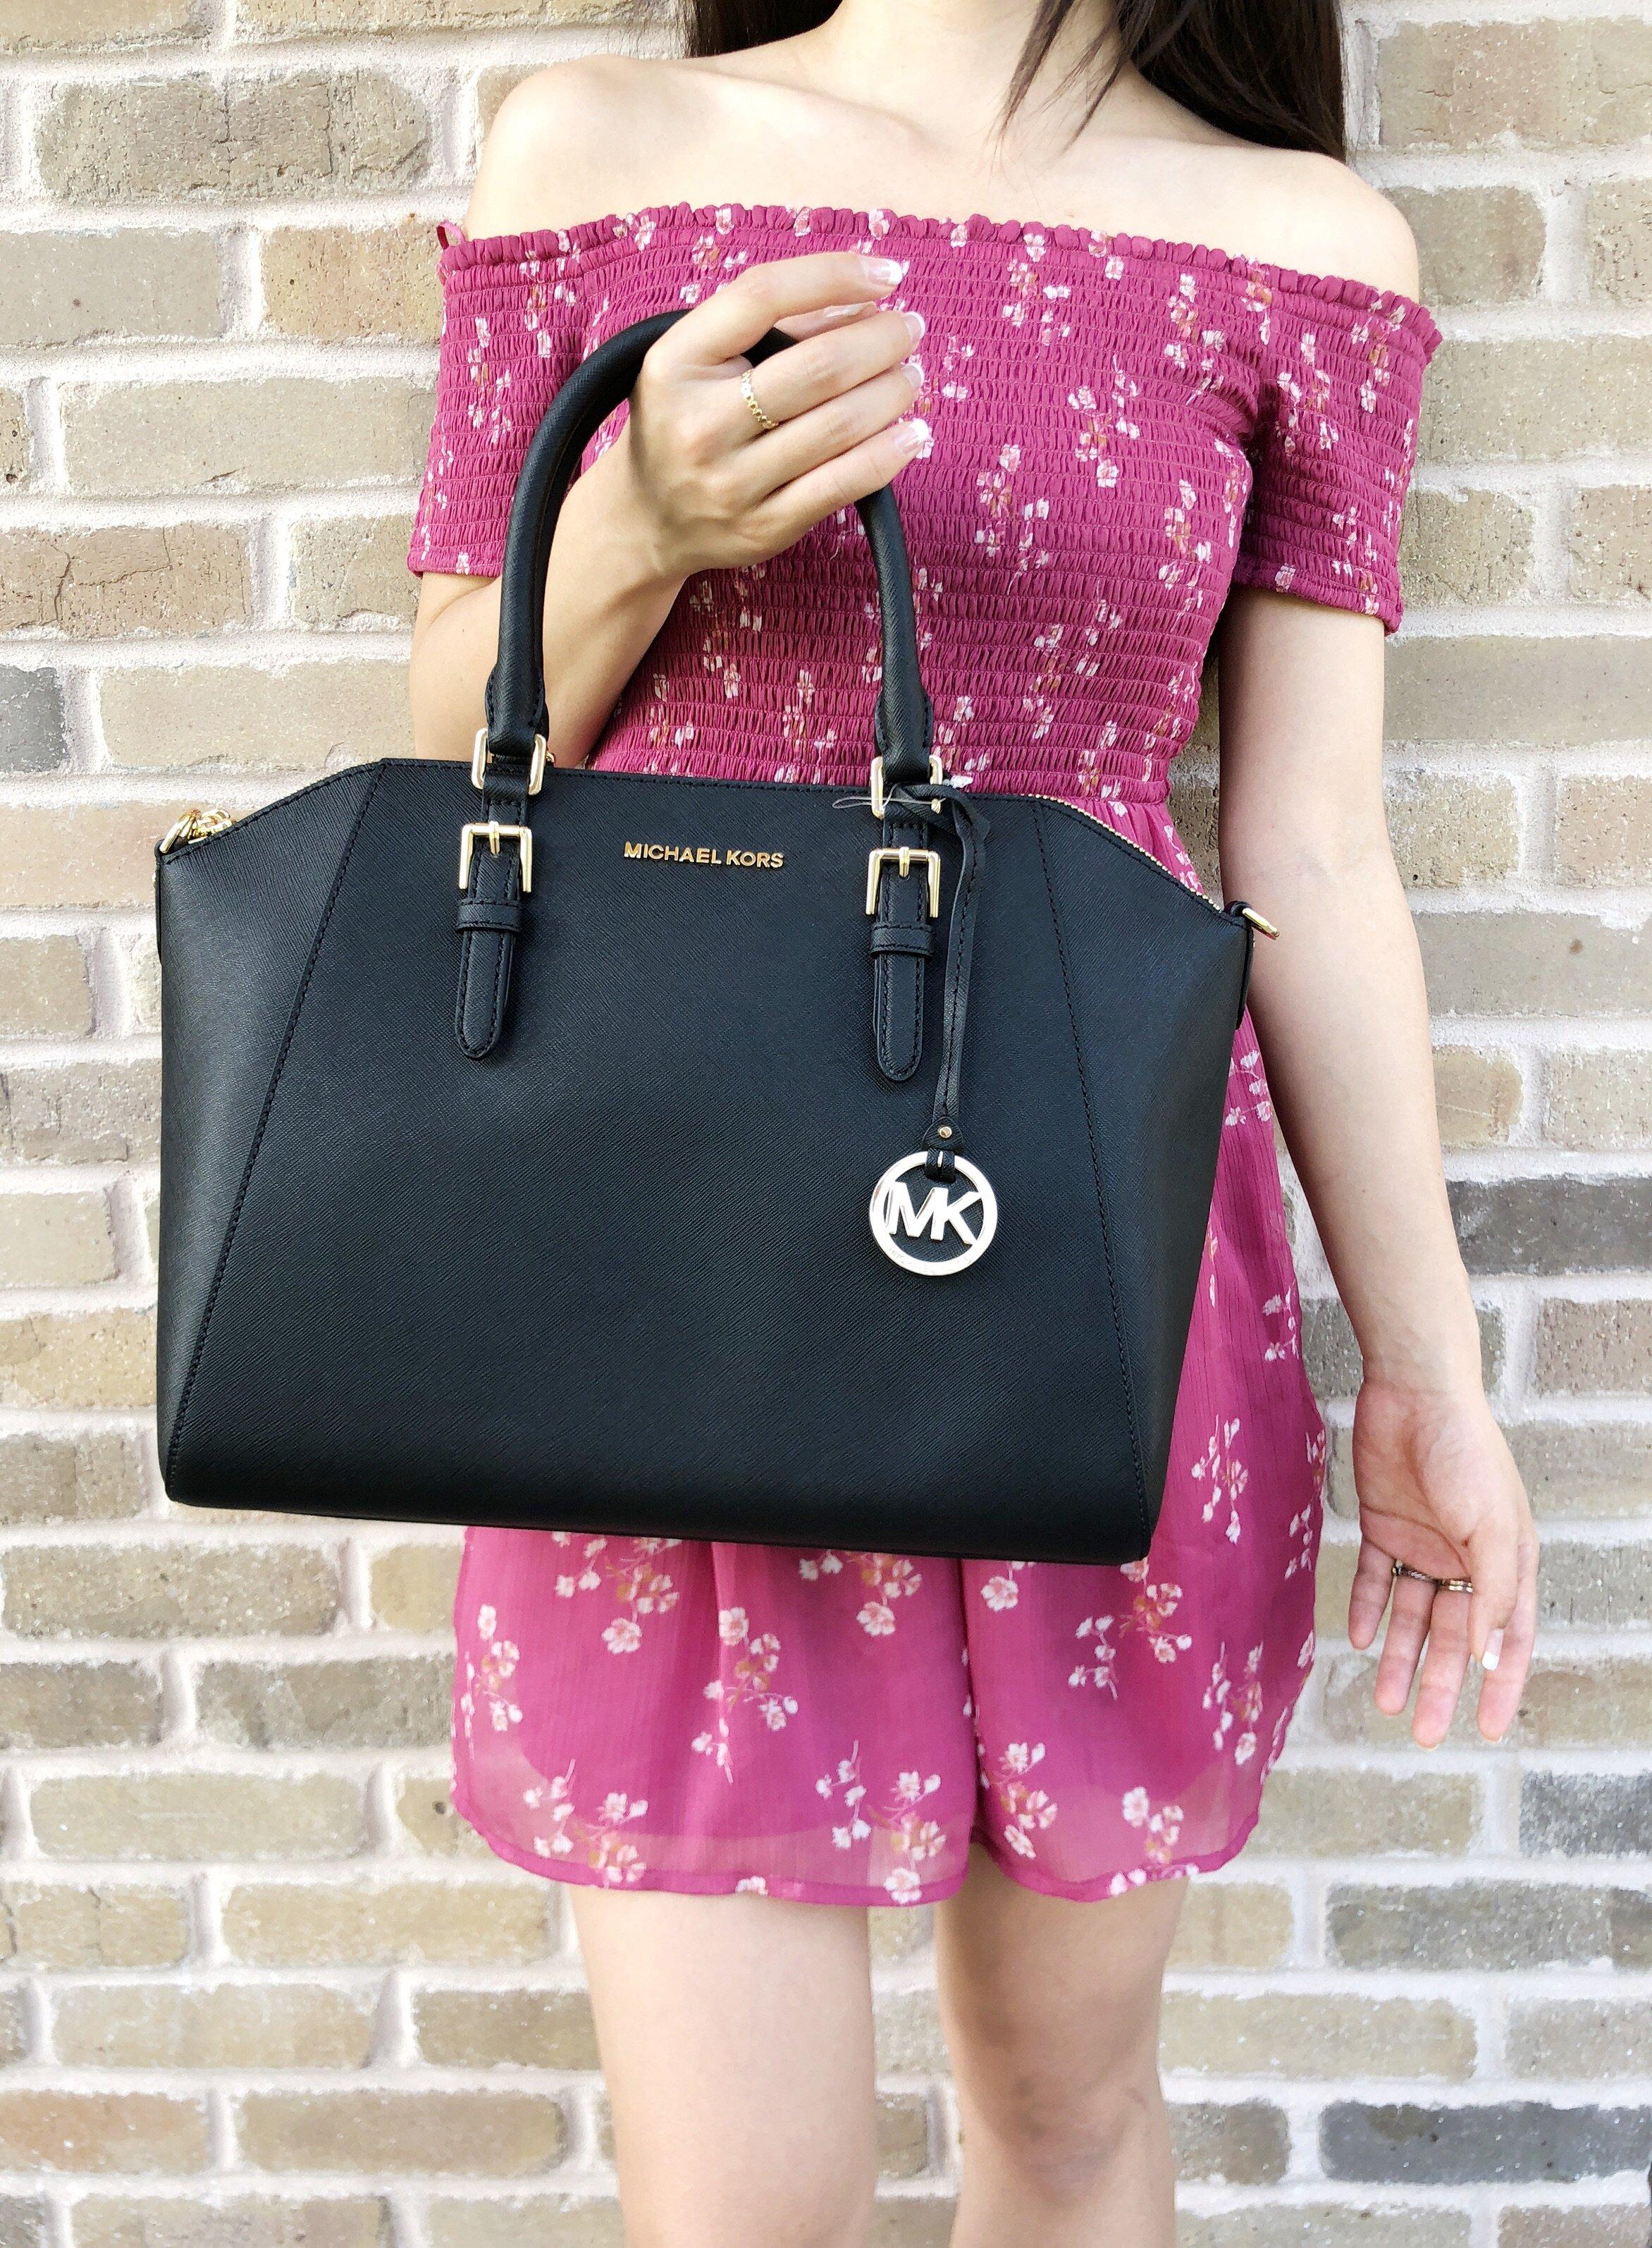 d39d0466470a Rakuten Home · Gaby s Bags. Michael Kors Large Ciara Top Zip Satchel Black  Saffiano Leather 0